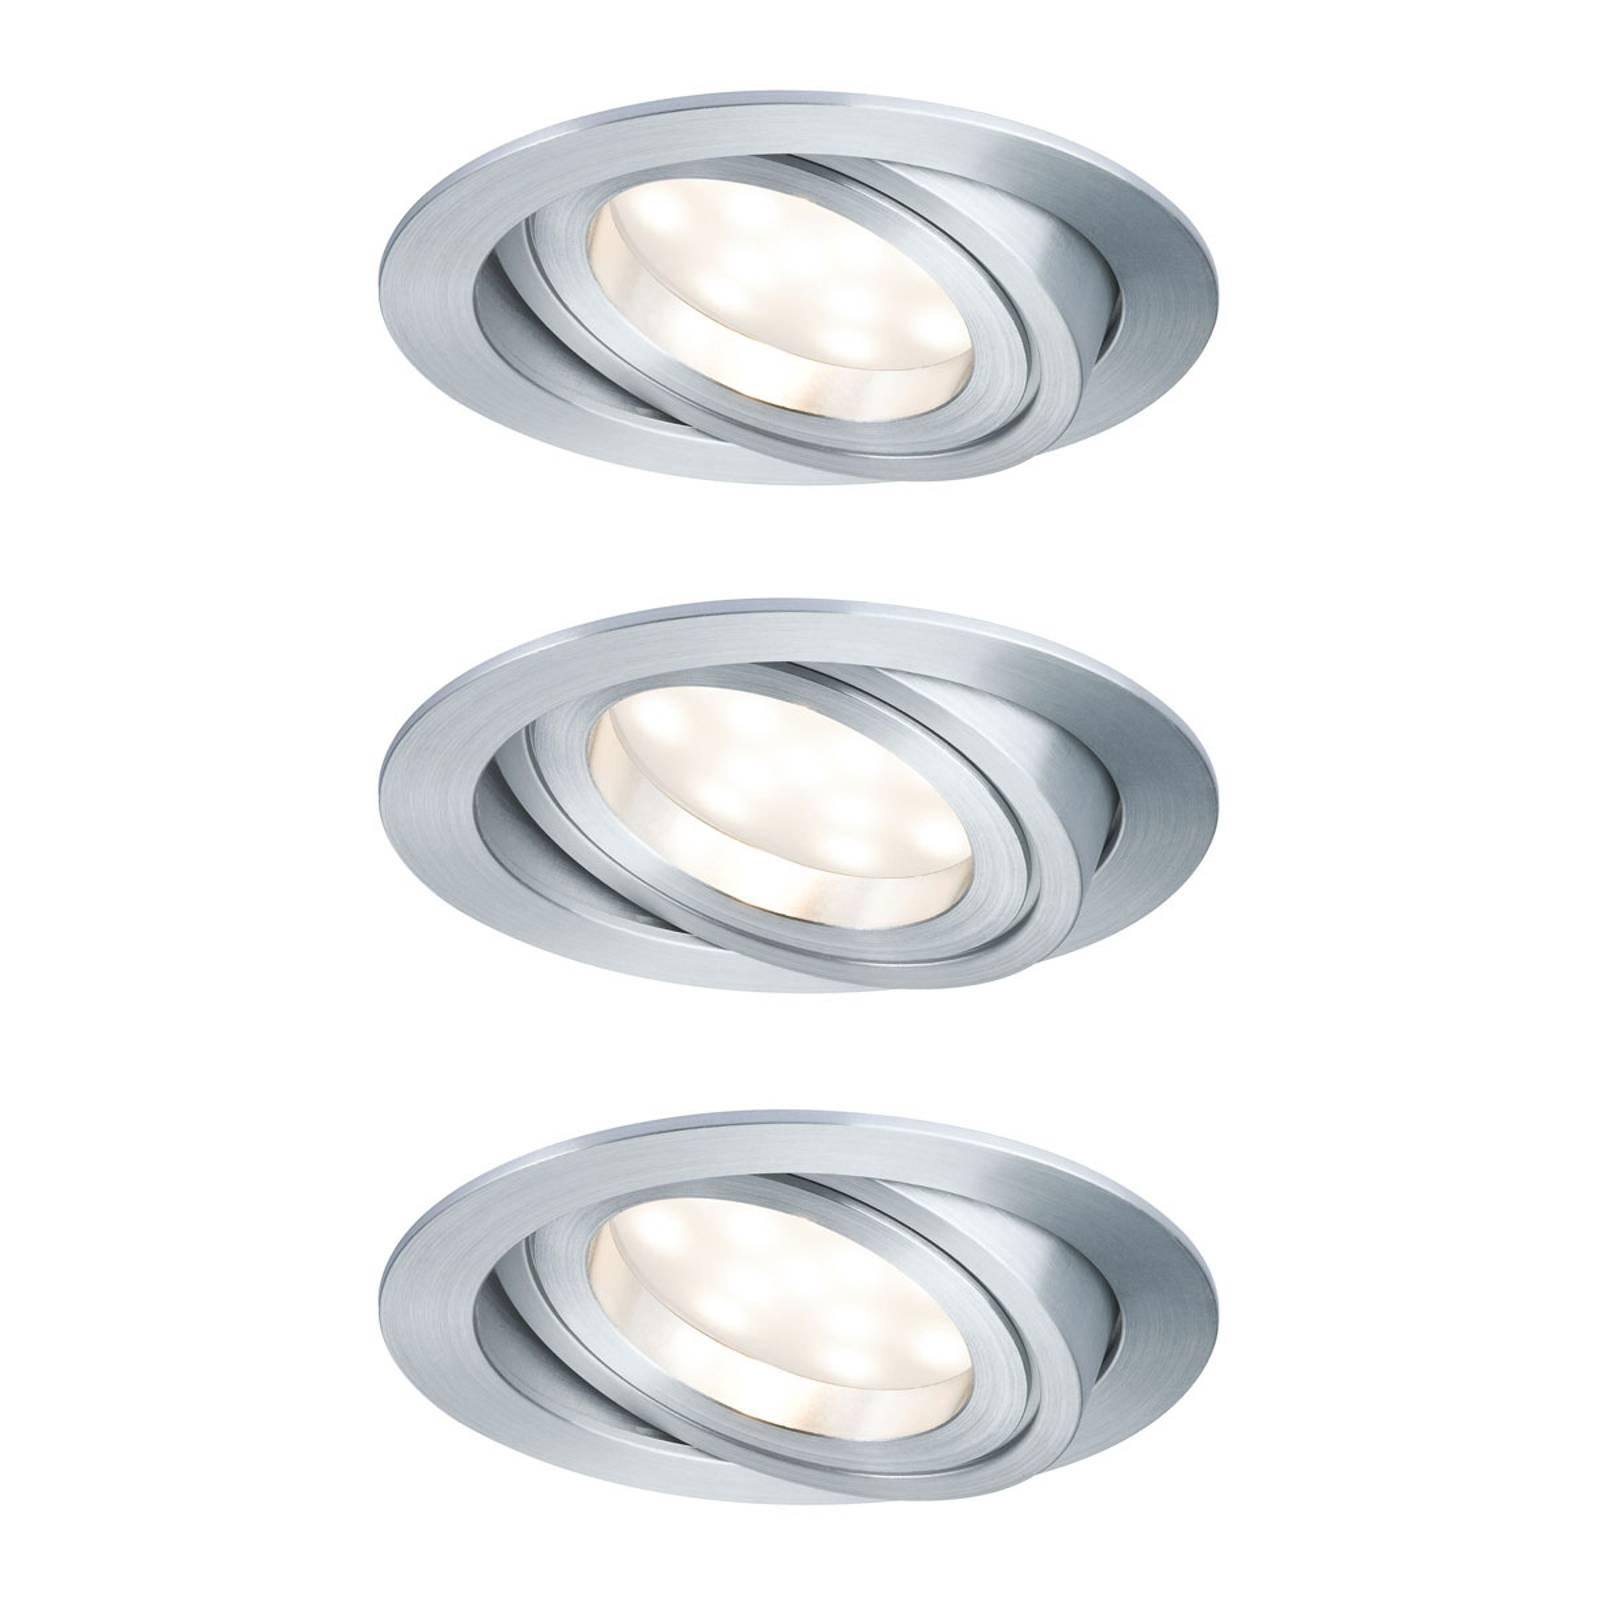 Paulmann LED-spotti Coin 3x7W, himmennys, taivutus